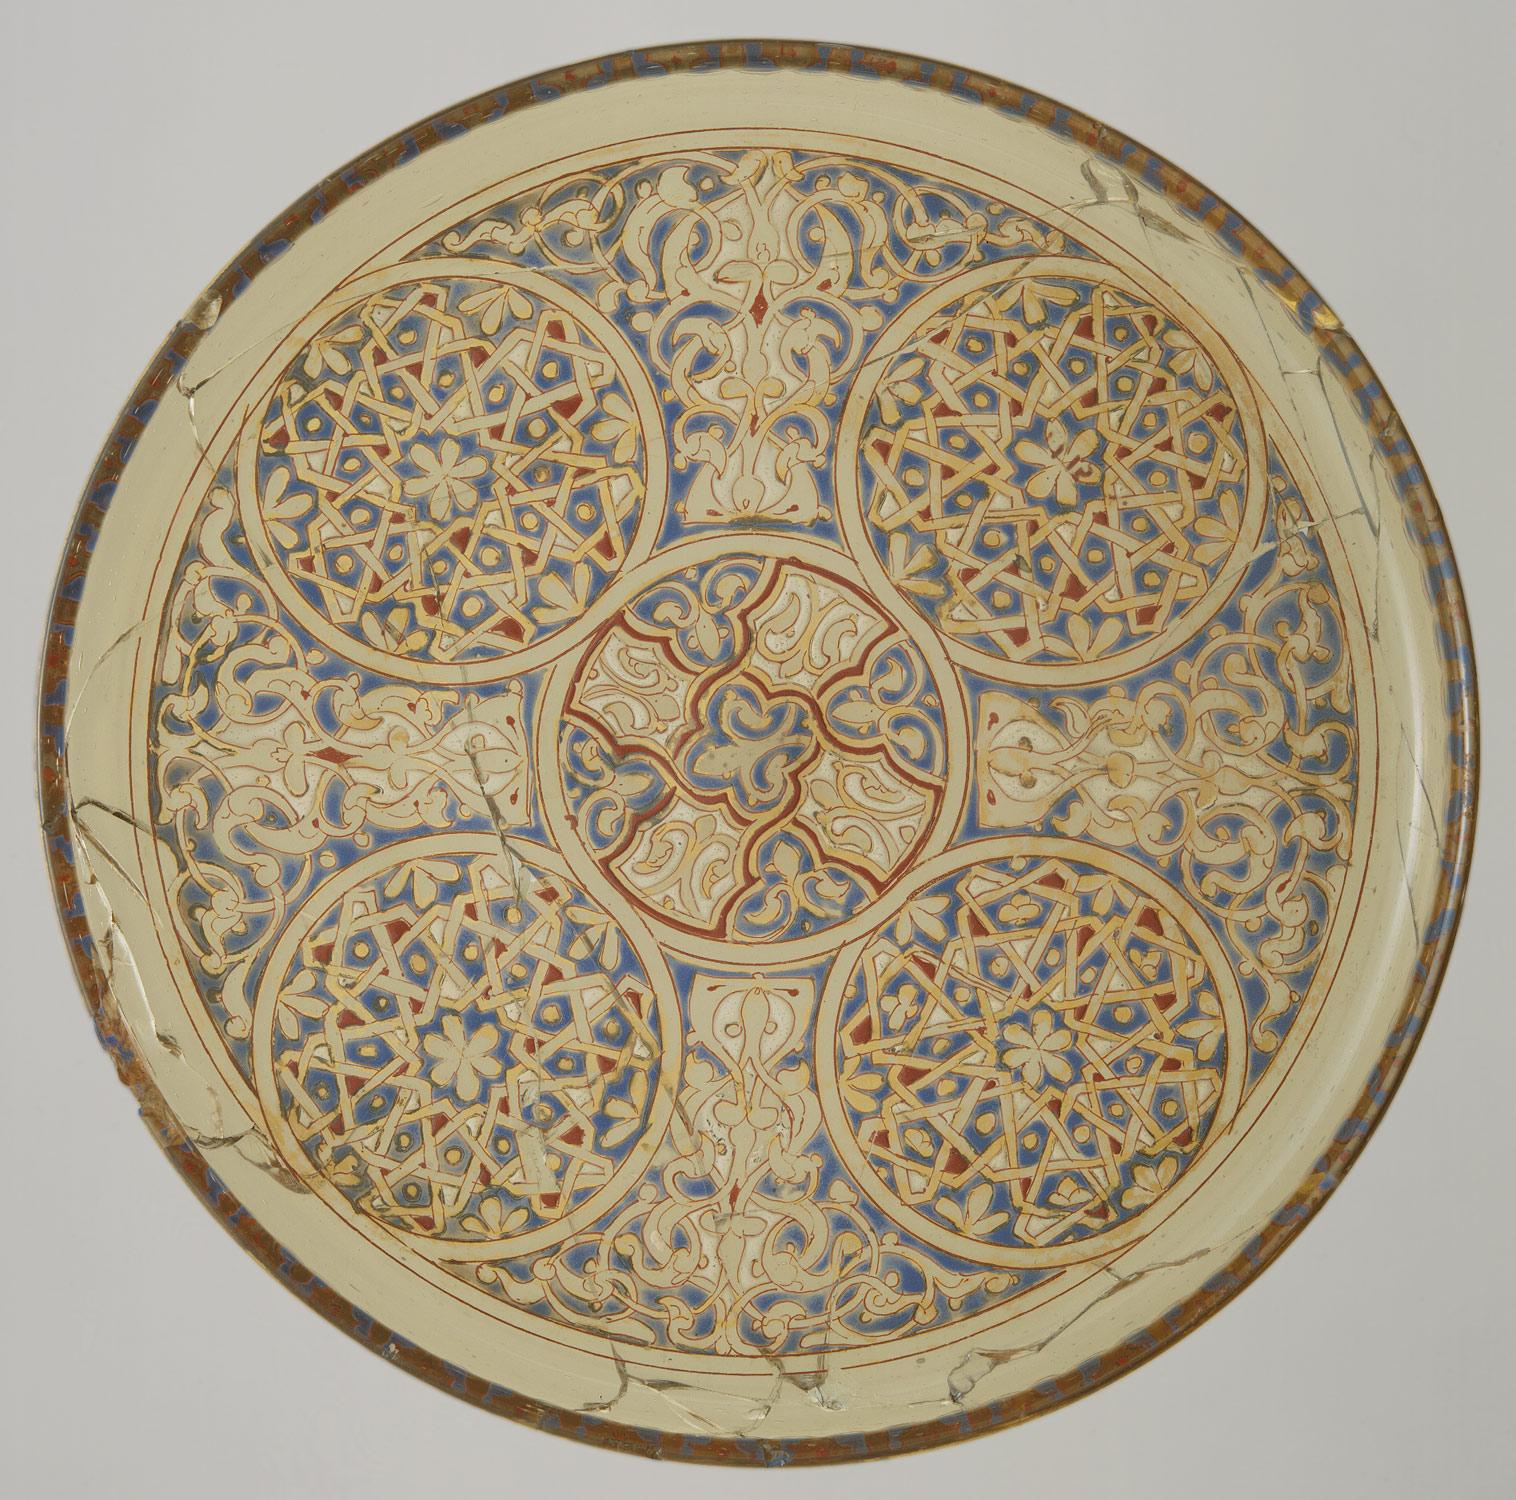 Geometric Patterns In Islamic Art Essay Heilbrunn